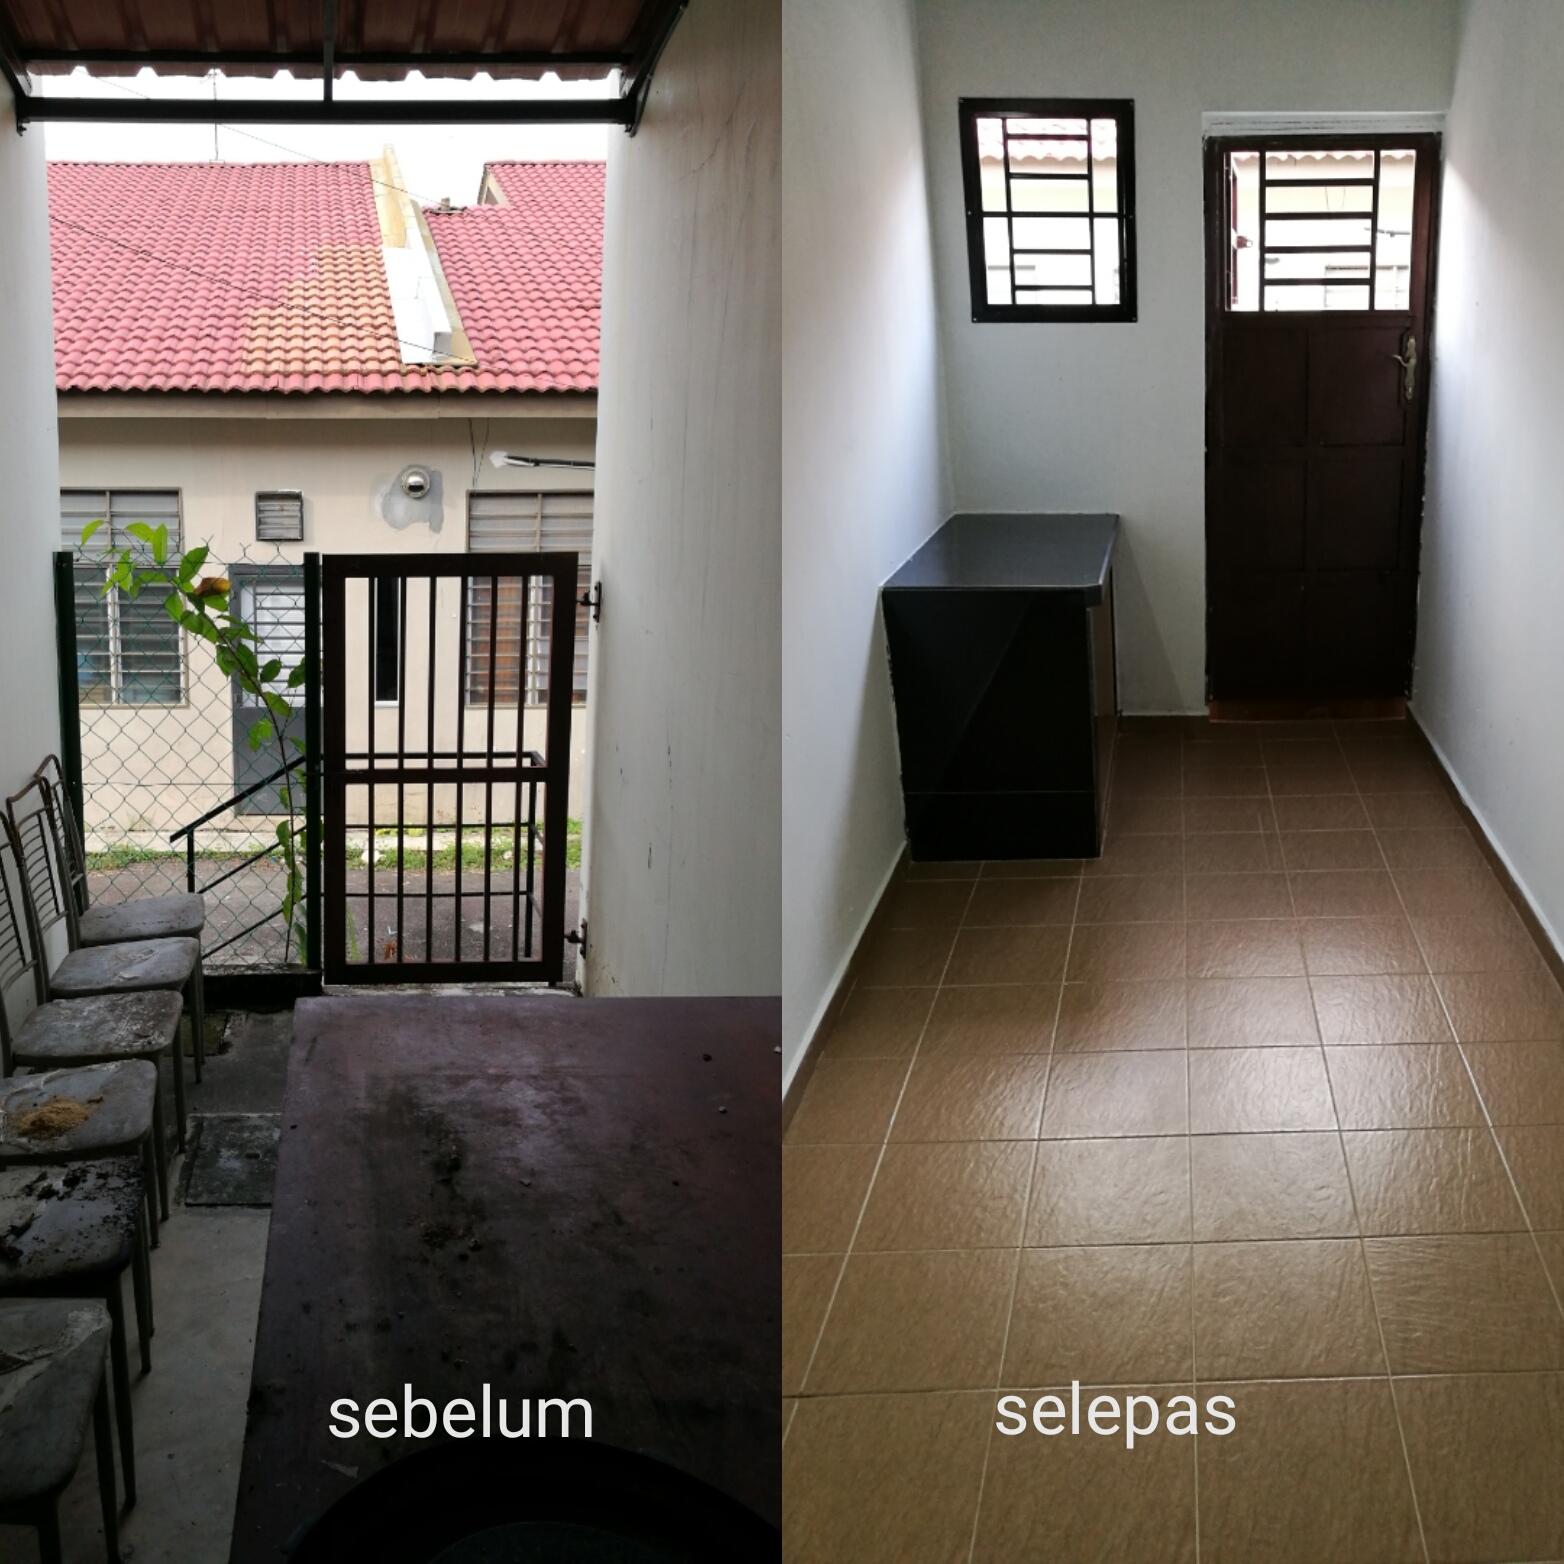 Blog Cikgu Zahidi Mi Casa Renovate Halaman Belakang Jadi Dapur Basah